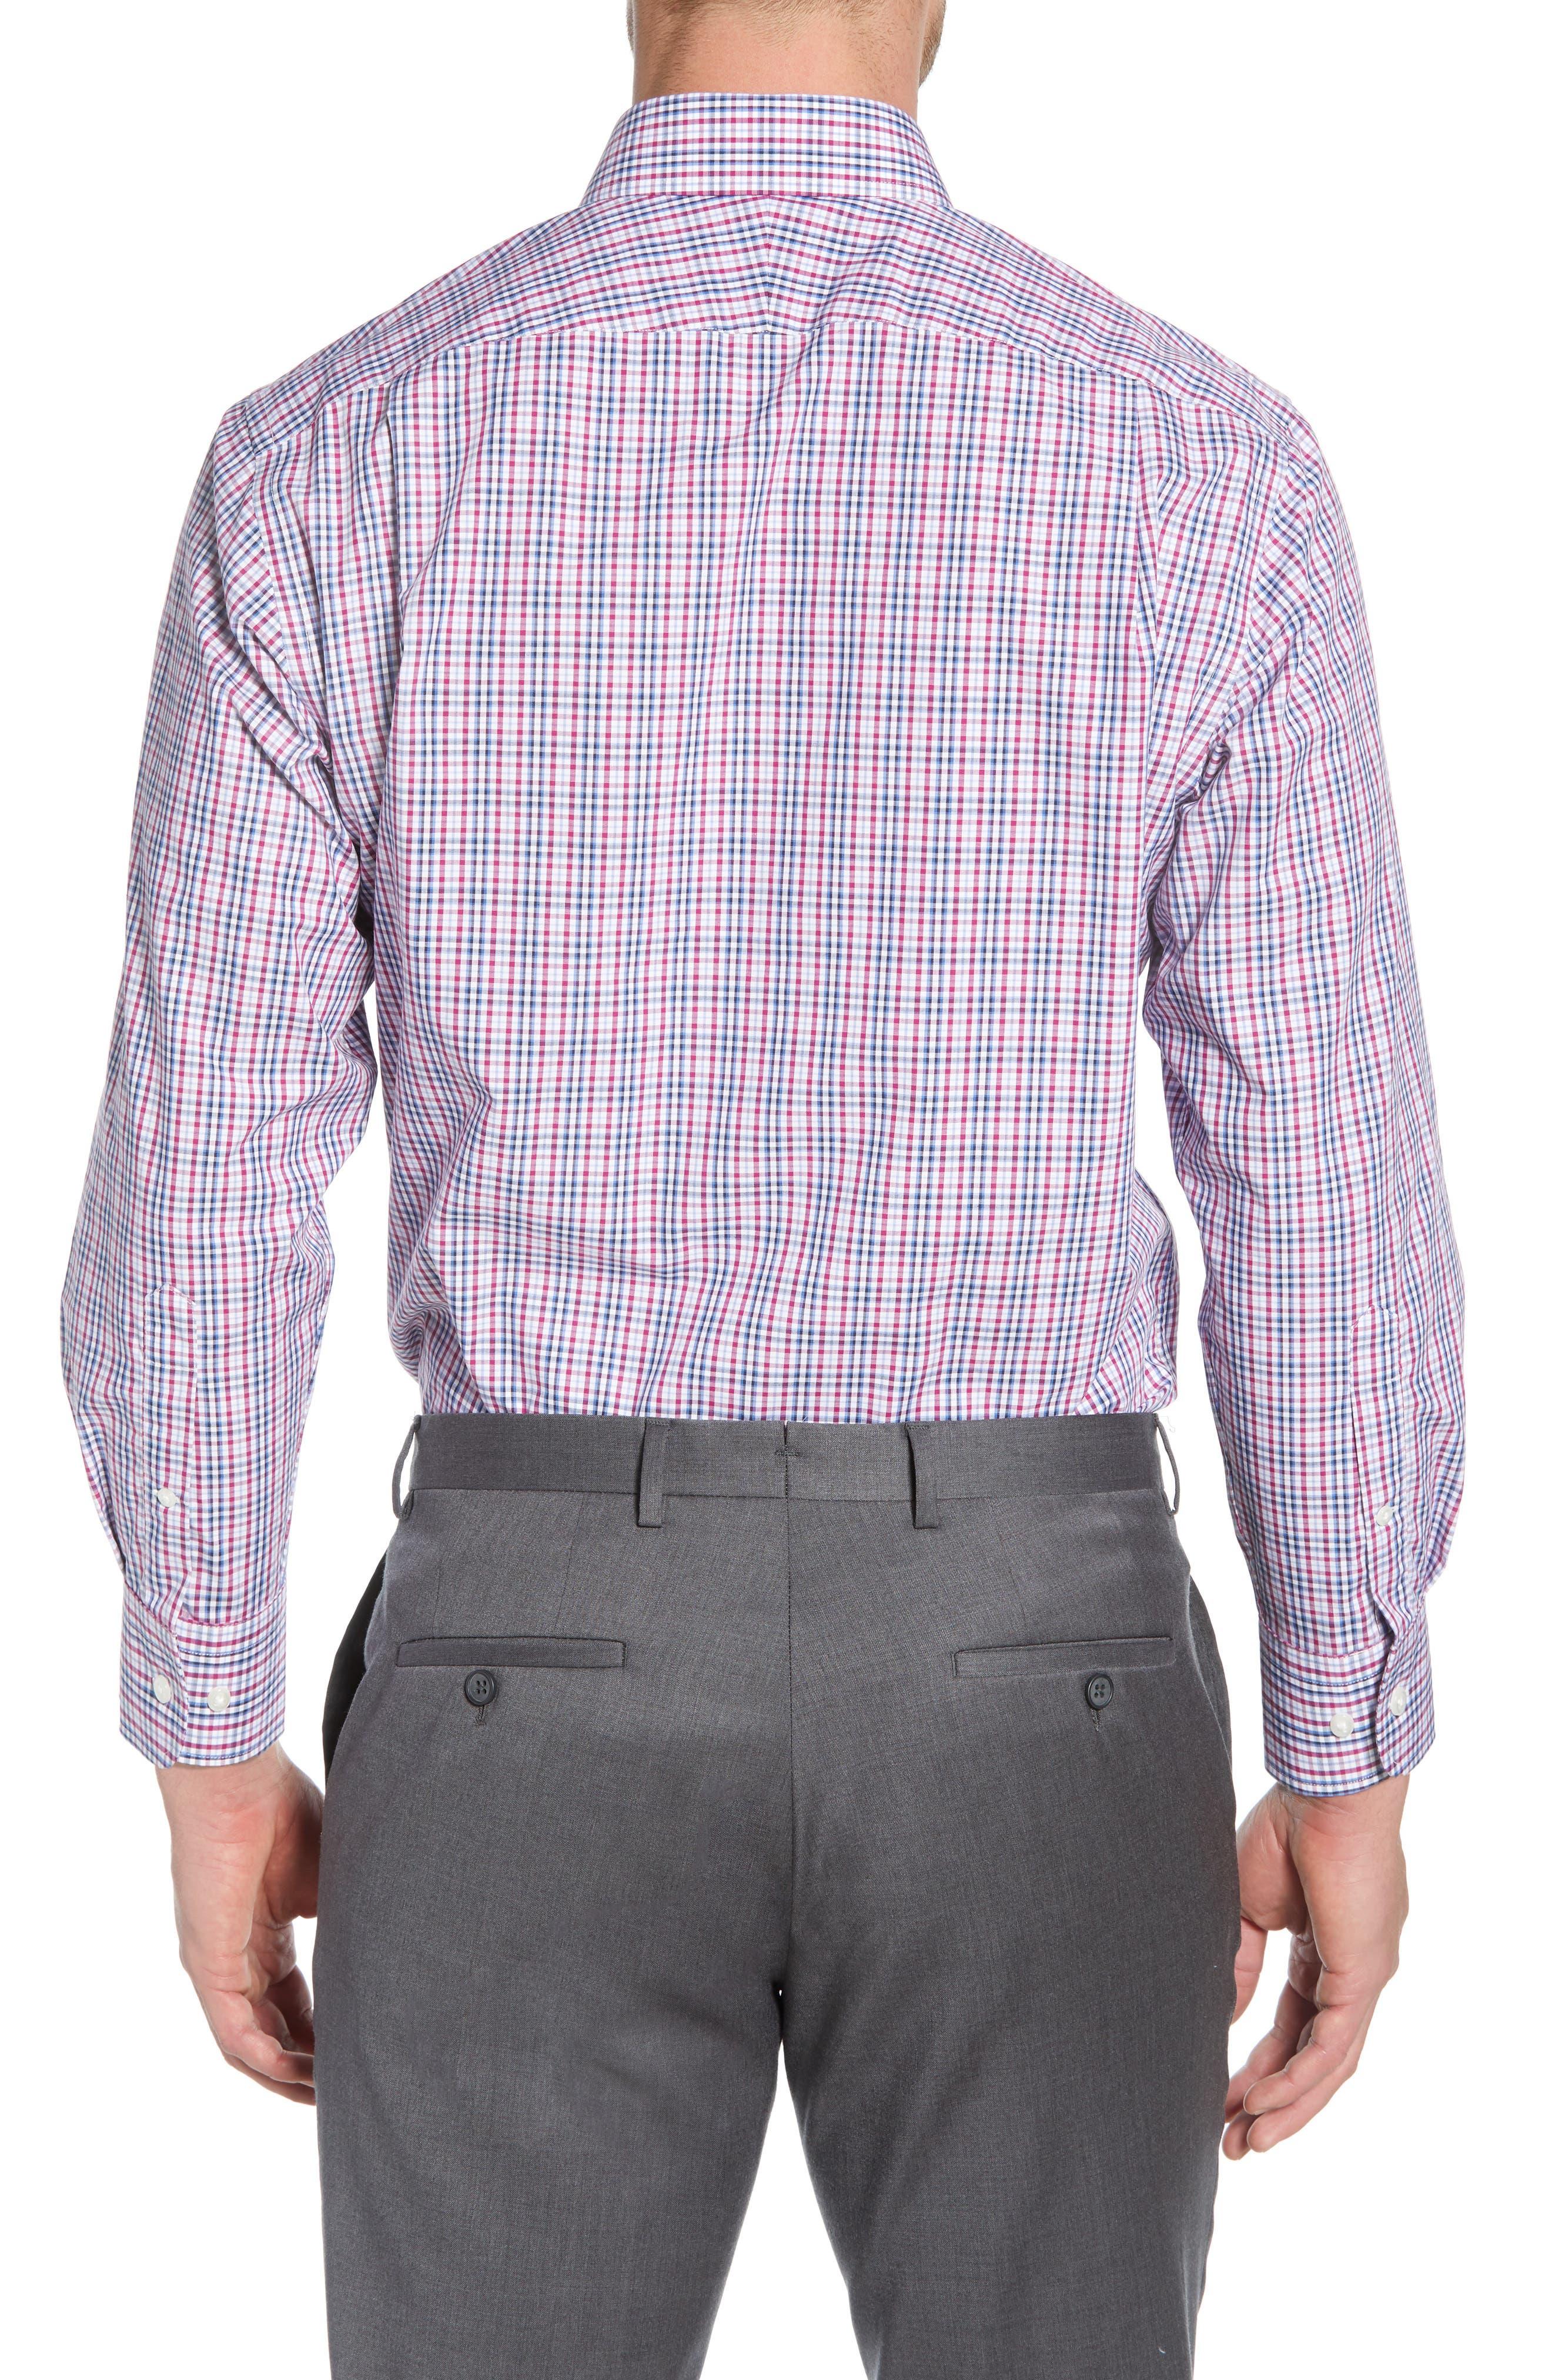 NORDSTROM MEN'S SHOP, Traditional Fit Non-Iron Plaid Dress Shirt, Alternate thumbnail 3, color, PURPLE BOYSEN